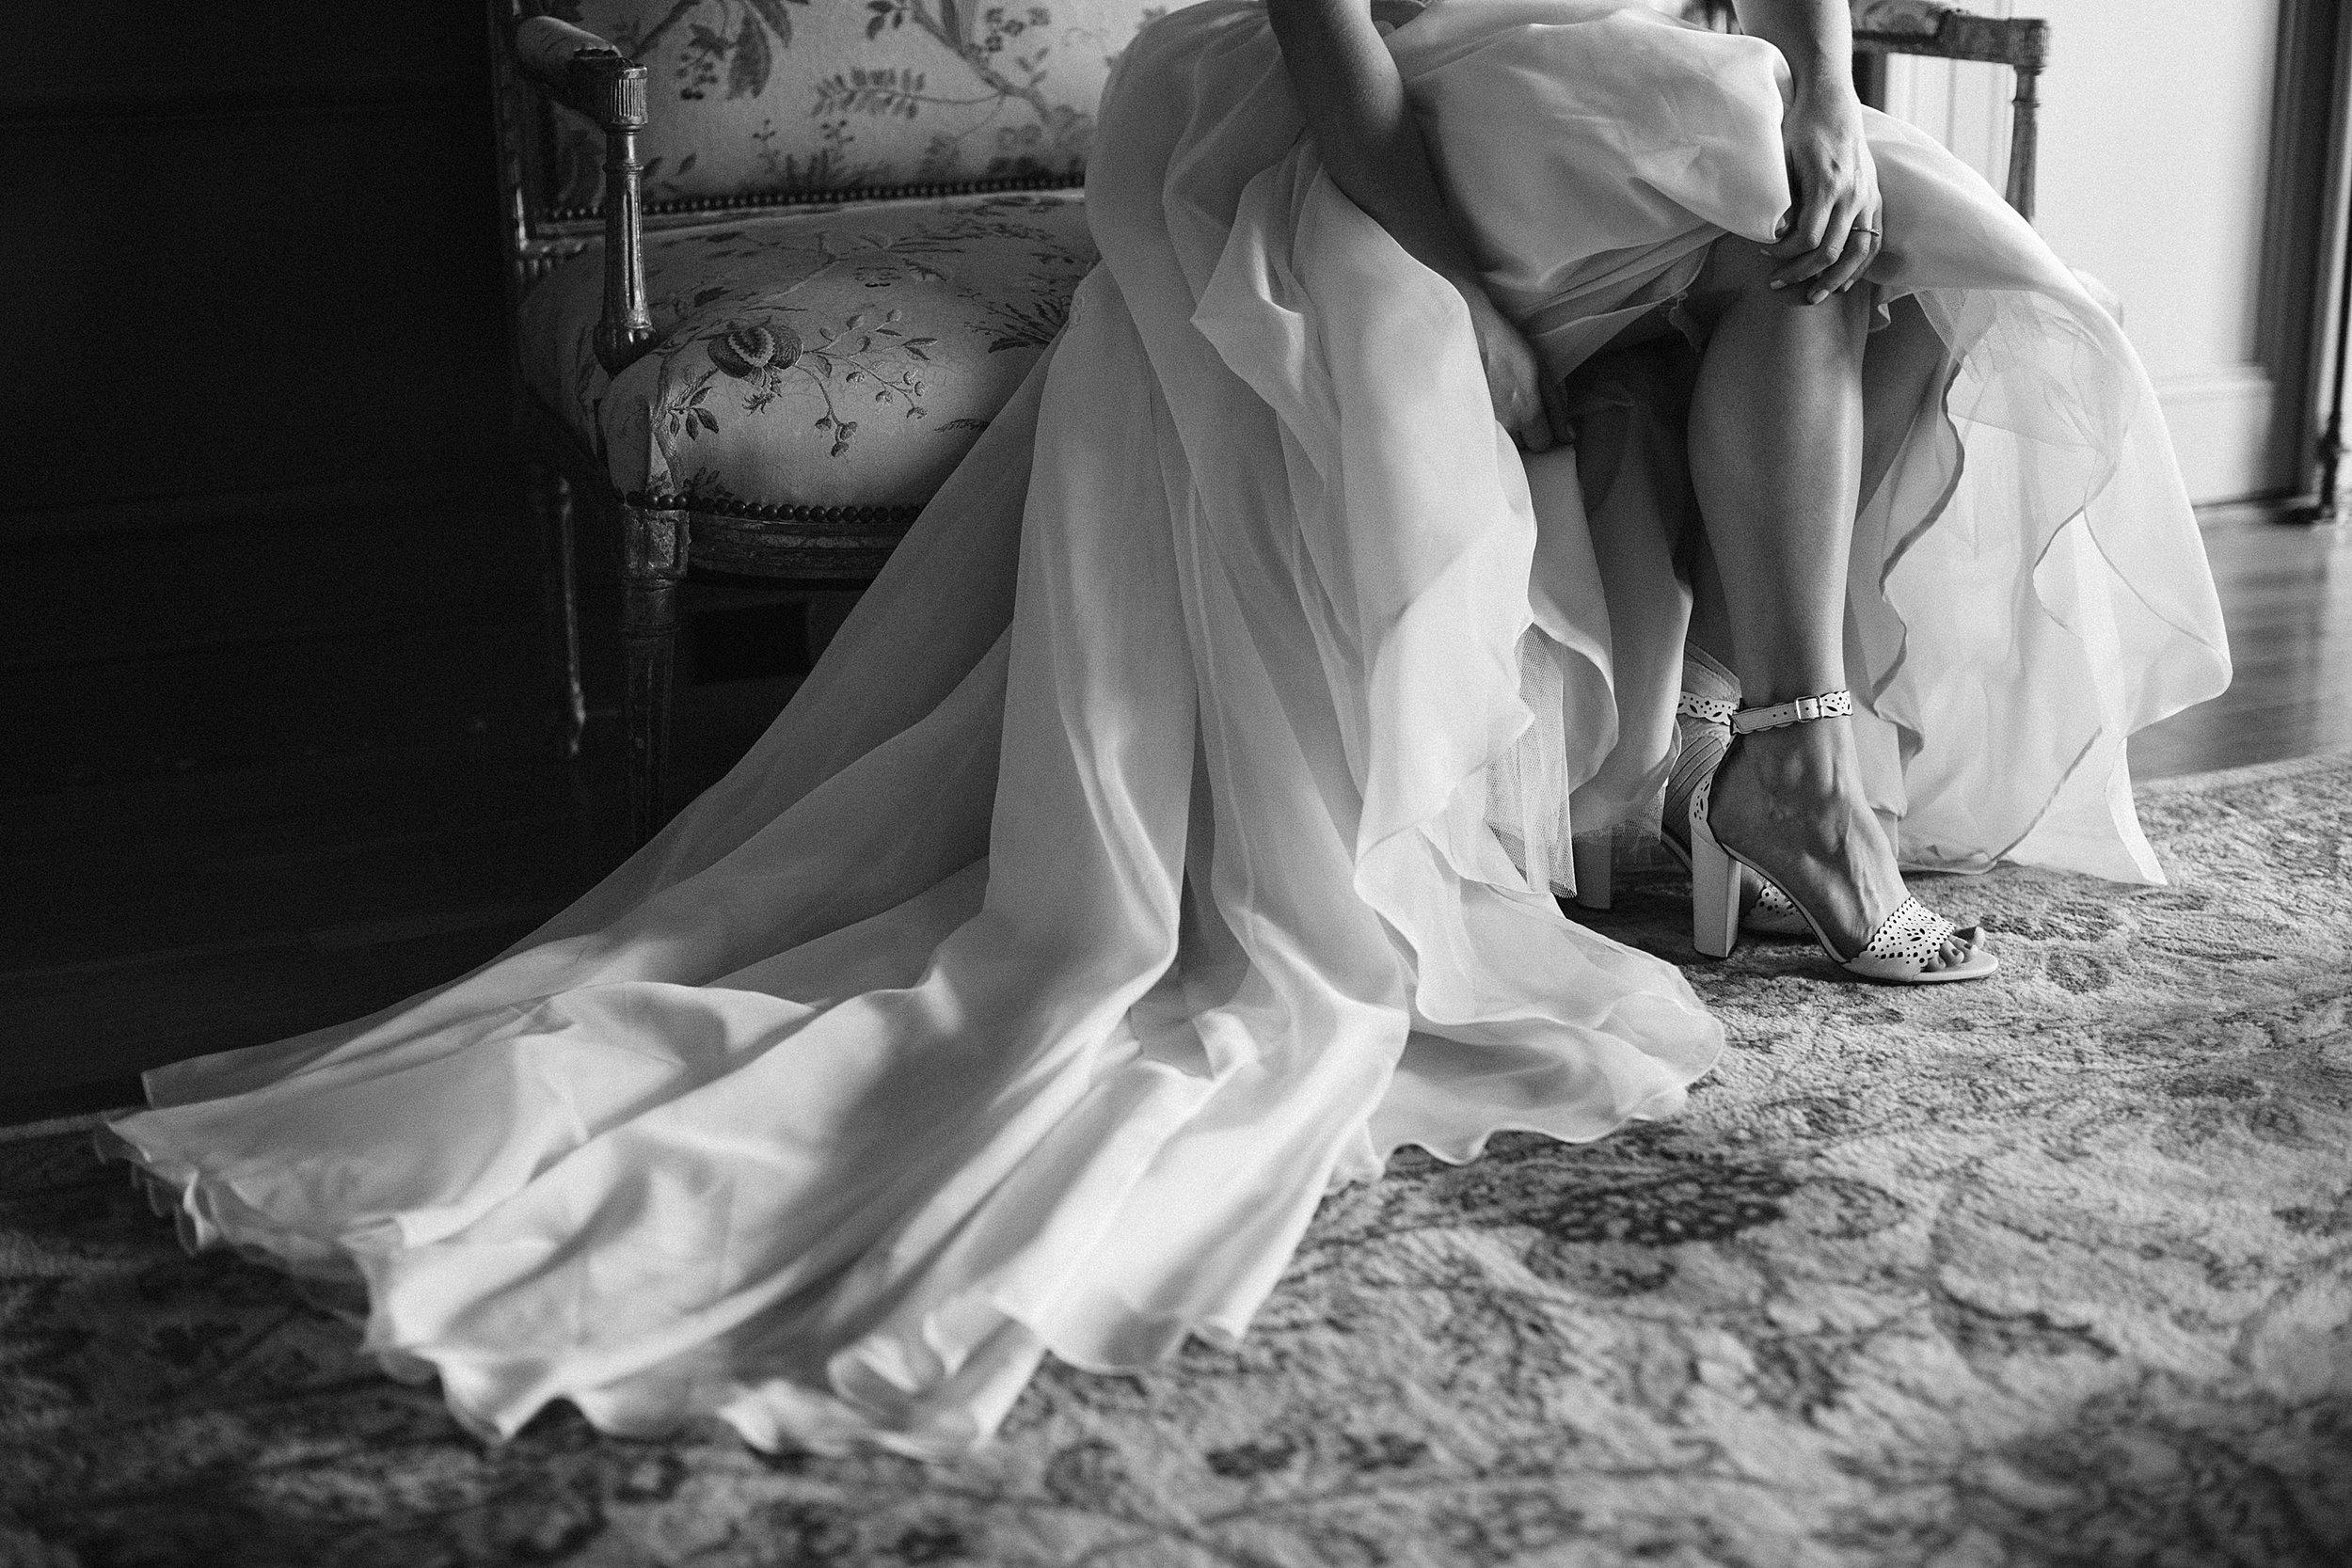 008 los angeles wedding photographer todd danforth photography boston.jpg